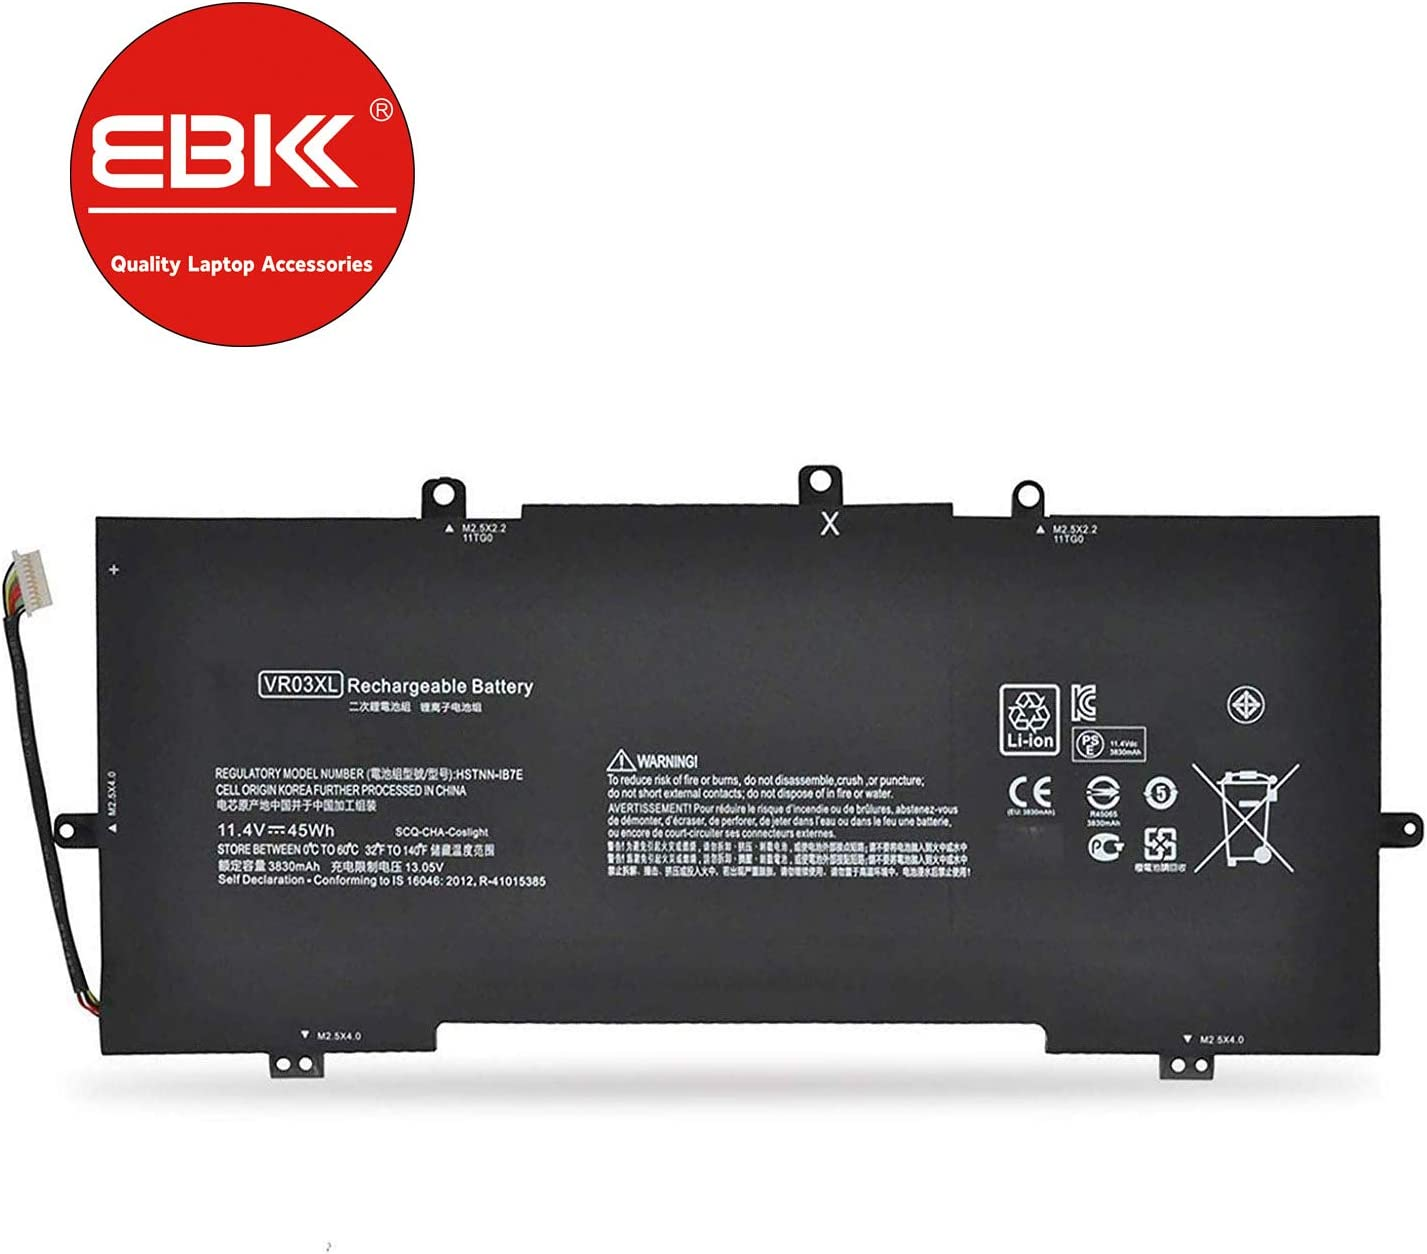 EBKK 45Wh VR03XL VR03 Battery for HP Envy 13 Series 13-D000 13-D000NA 13-D046TU 13-D023TU 13-D024TU 13-D025TU 13-D040WM 13-d002ng 13-d003ng 13-d004ng HSTNN-IB7E TPN-C120